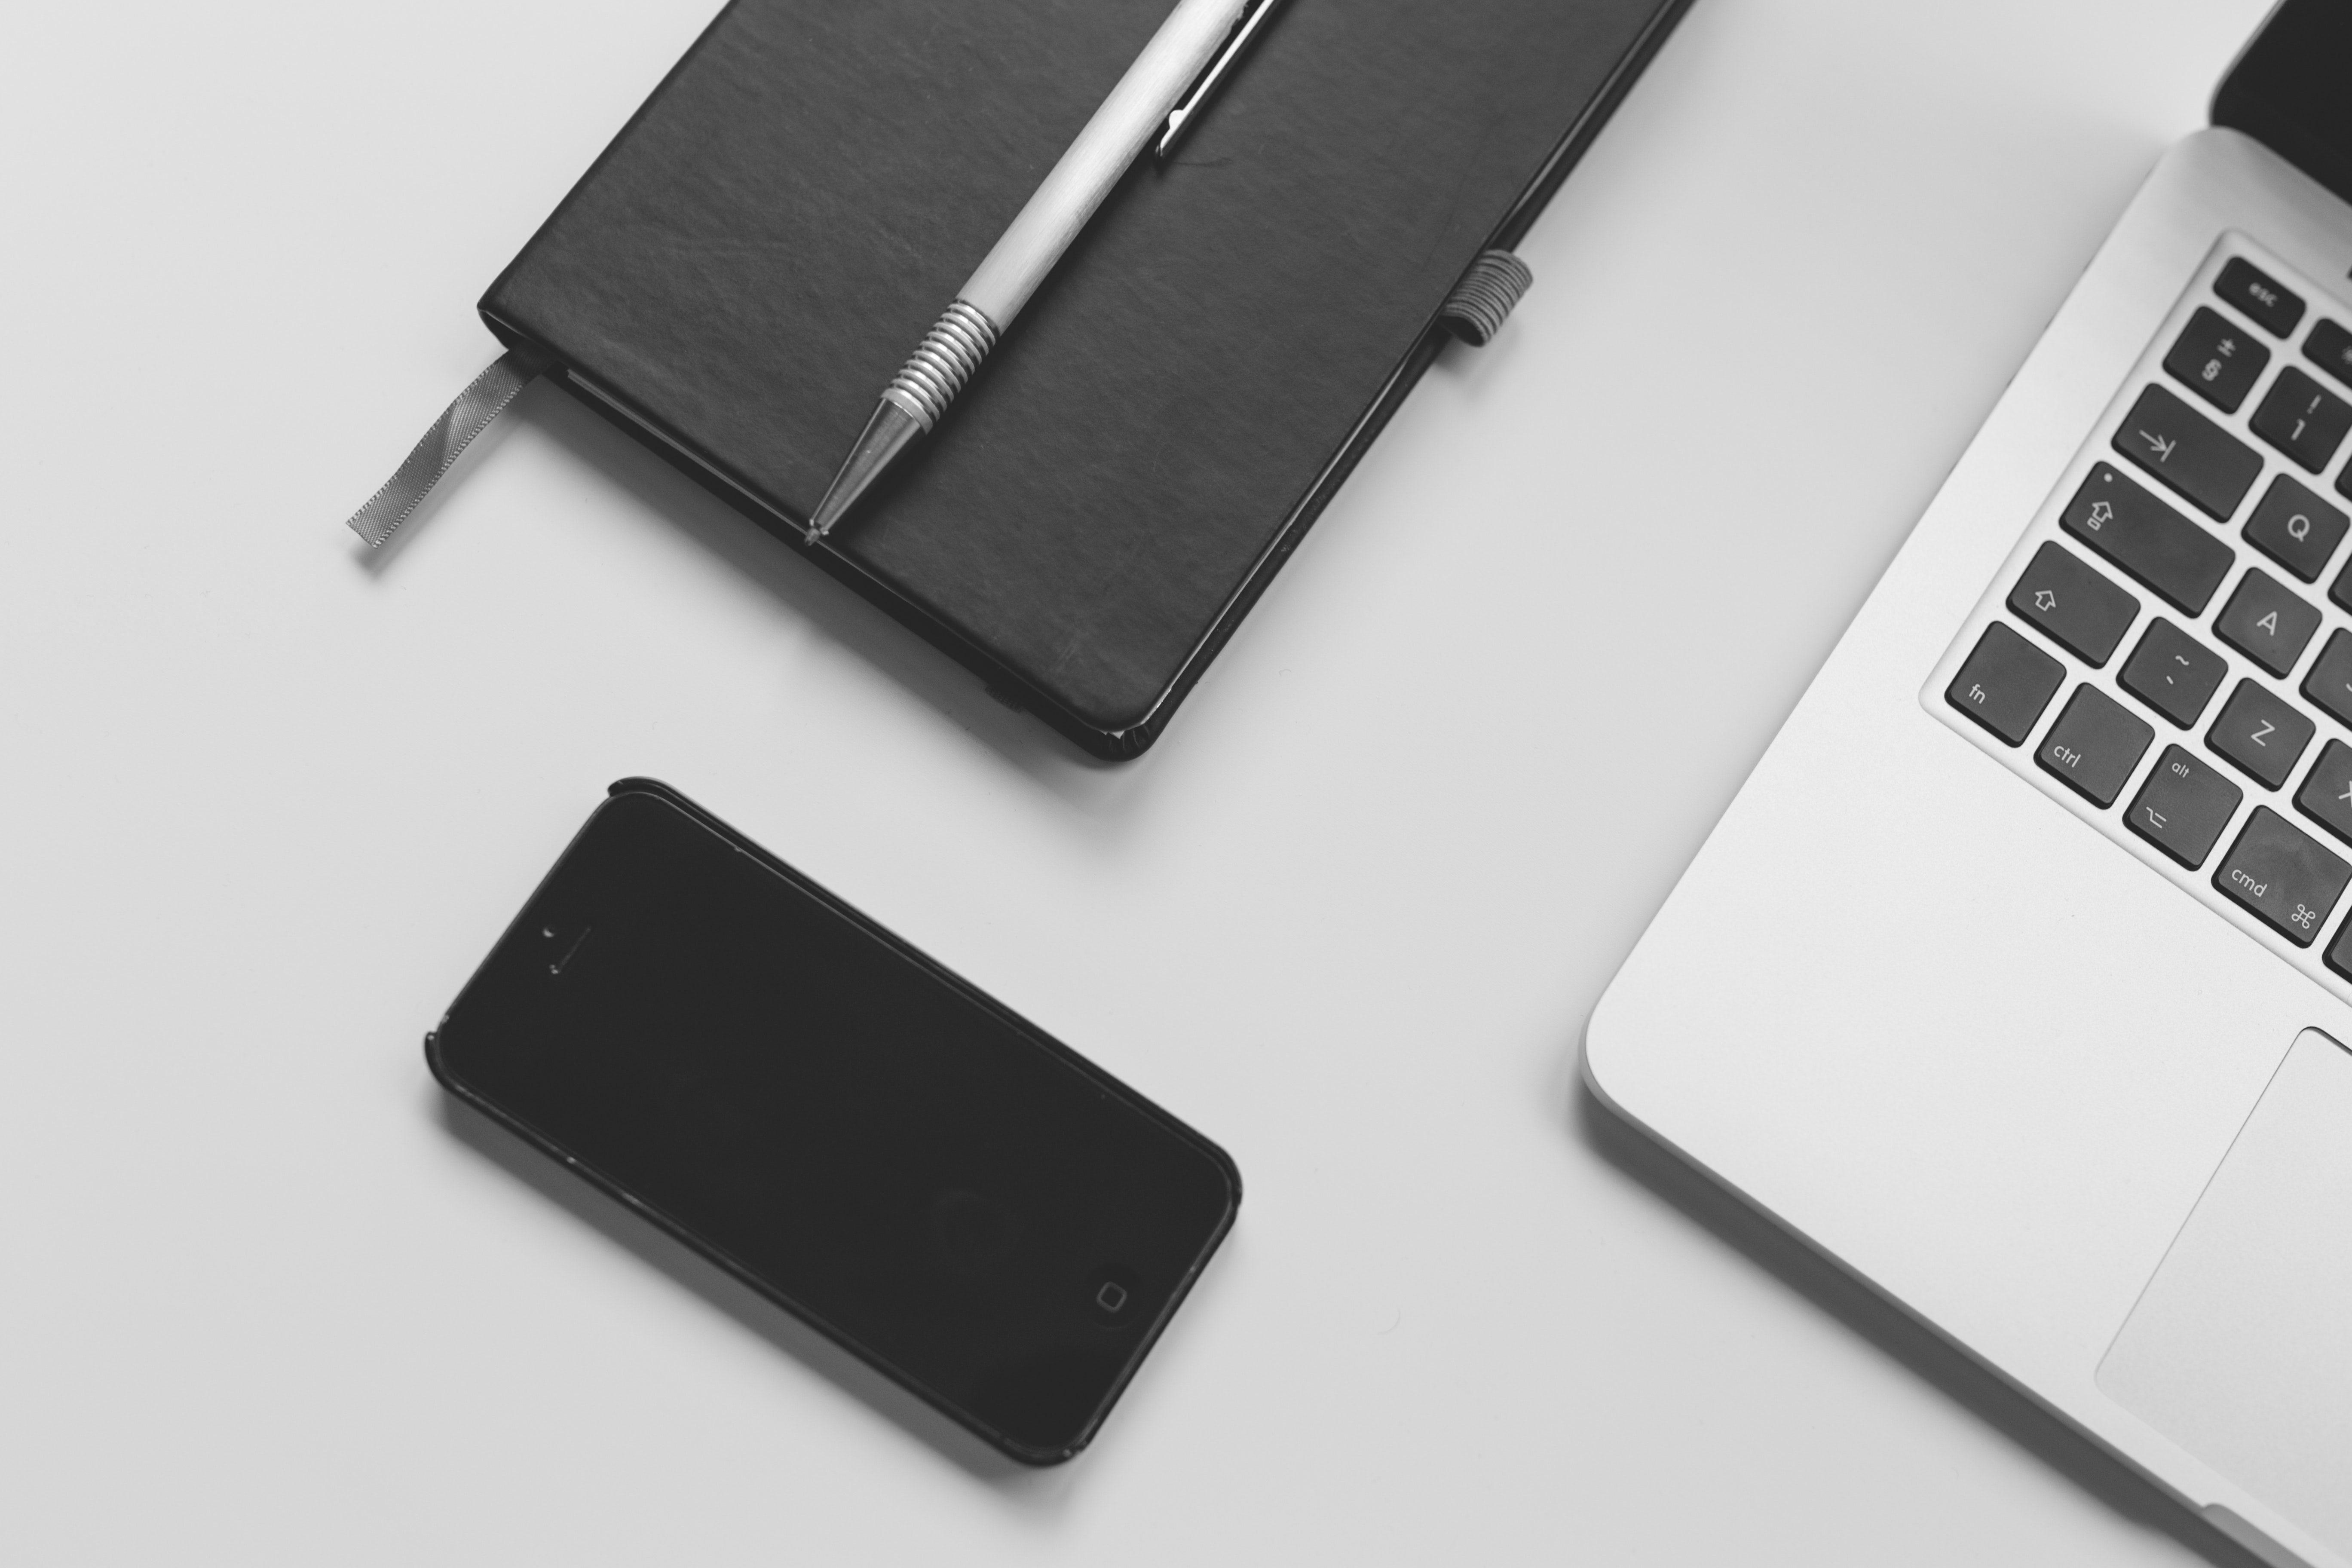 Black iphone 5 near macbook pro photo